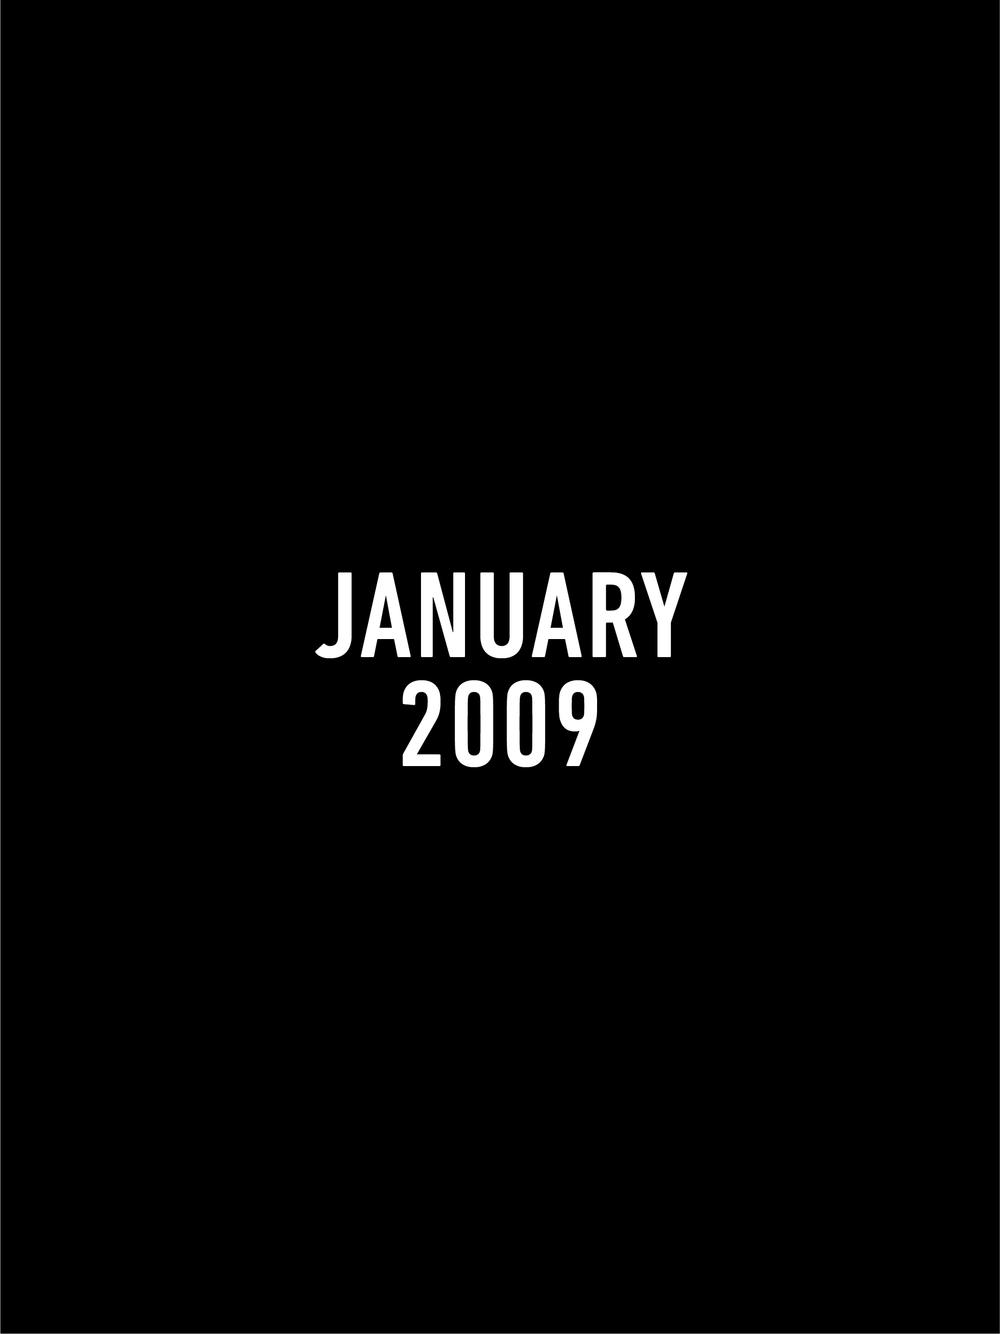 2009 monthly.jpg